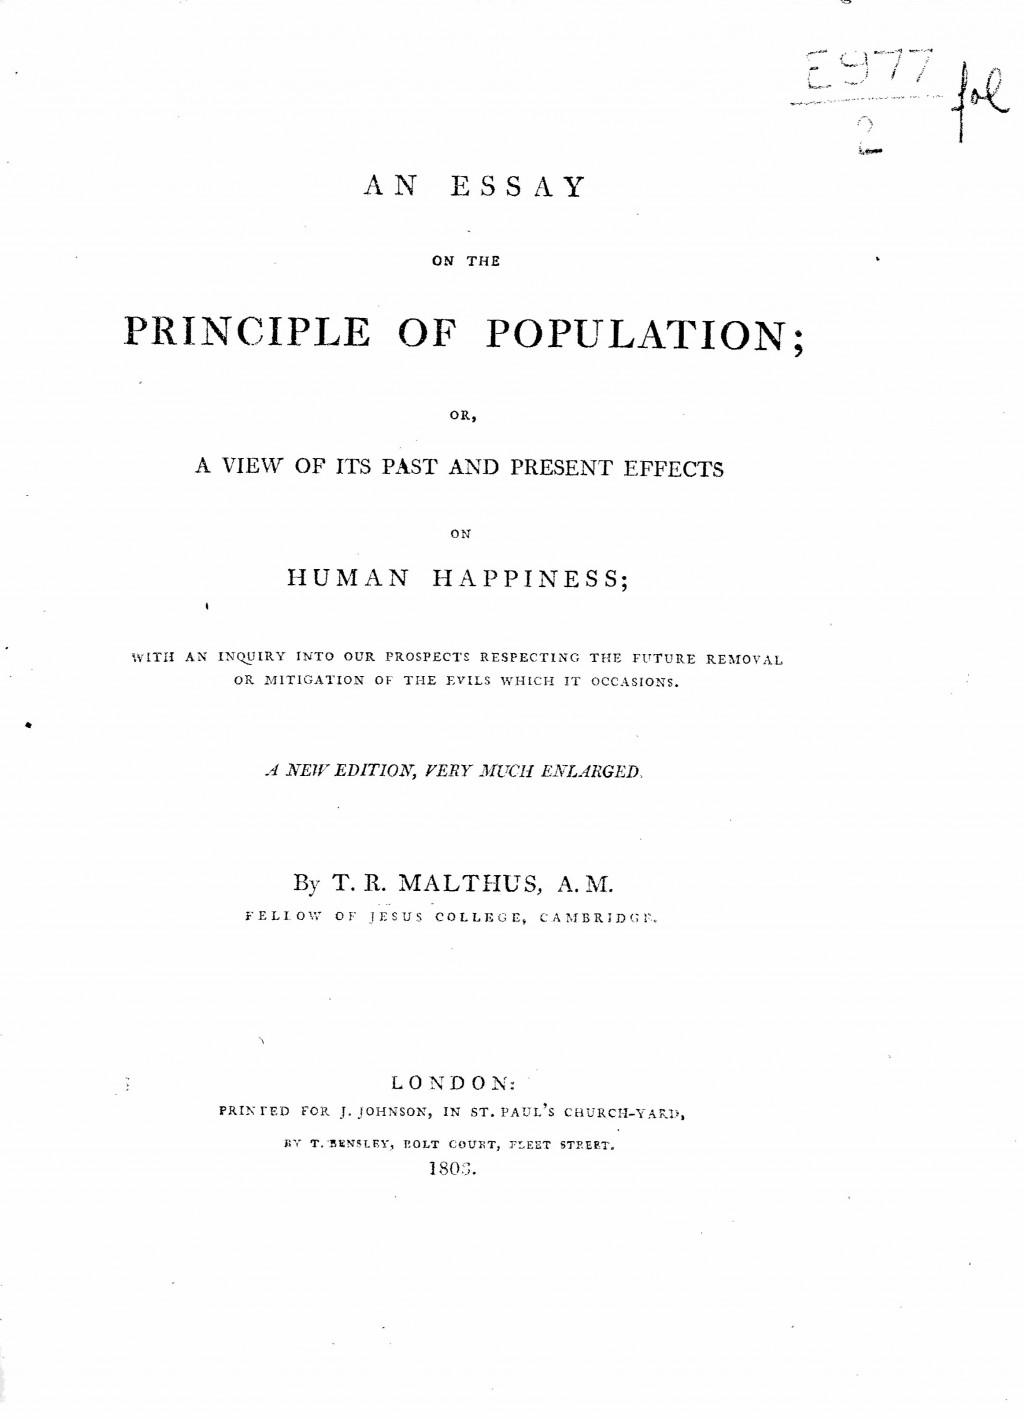 002 Thomas Malthus Essay On The Principle Of Population 2fol Stupendous After Reading Malthus's Principles Darwin Got Idea That Ap Euro Large